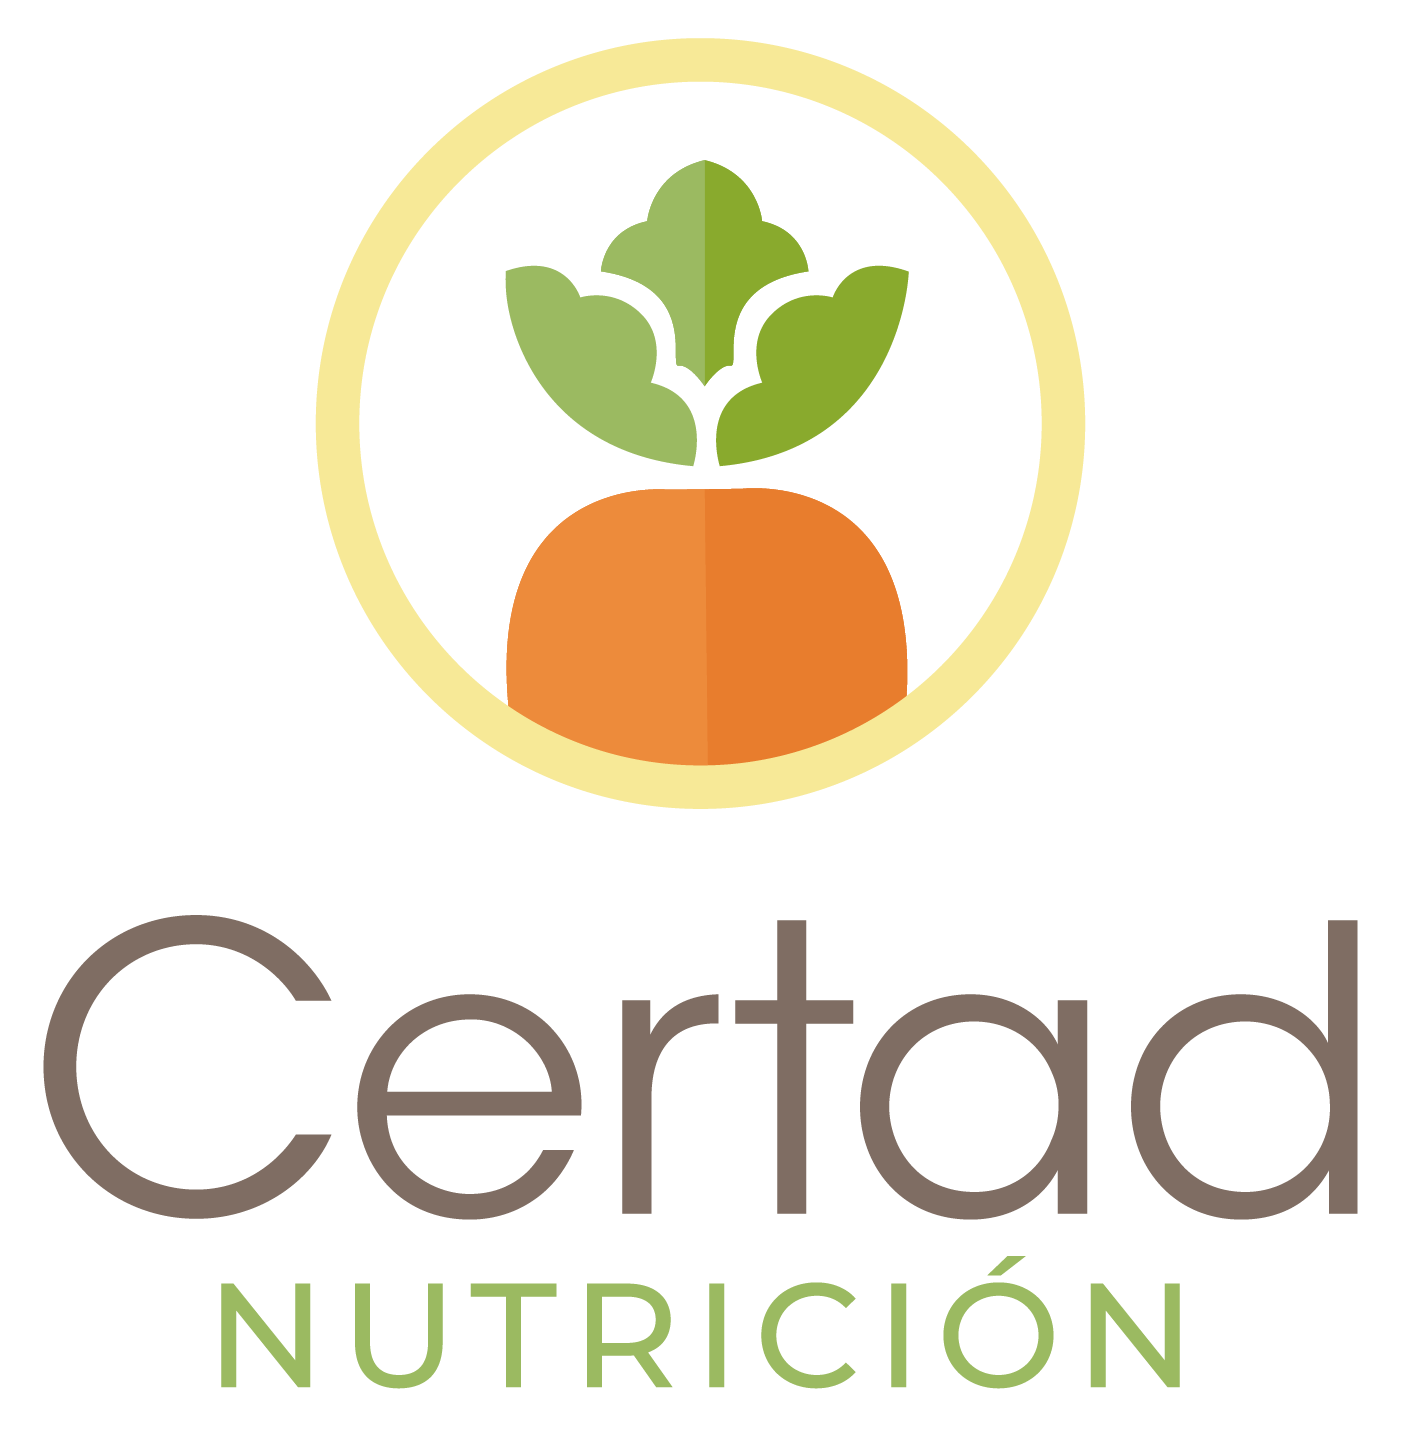 Certad Nutrcion logo